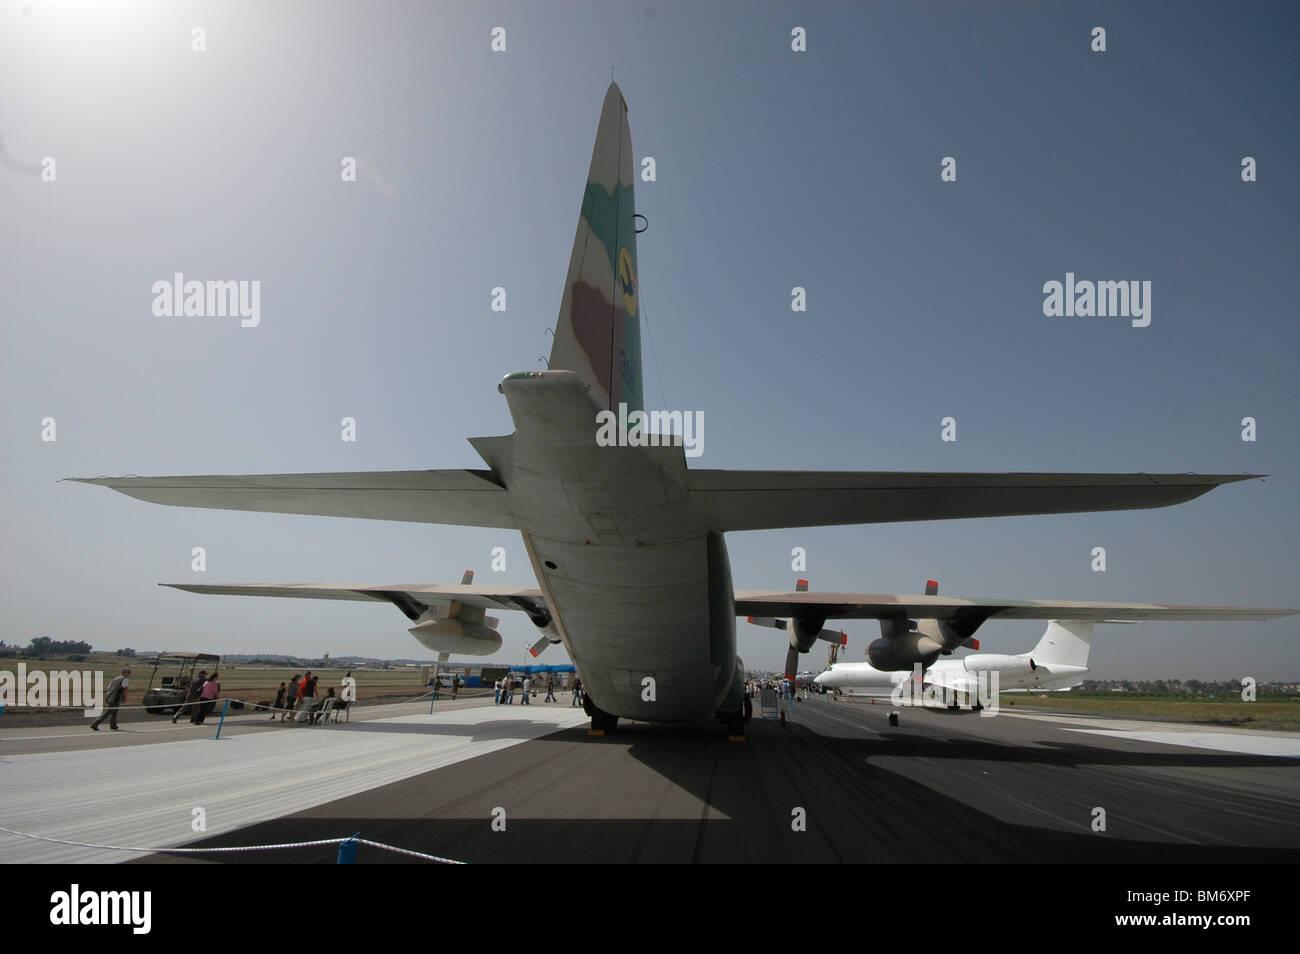 Israel, Tel Nof IAF Base  An Israeli Air force (IAF) exhibition. C-130 Hercules 100 transport plane on the ground - Stock Image